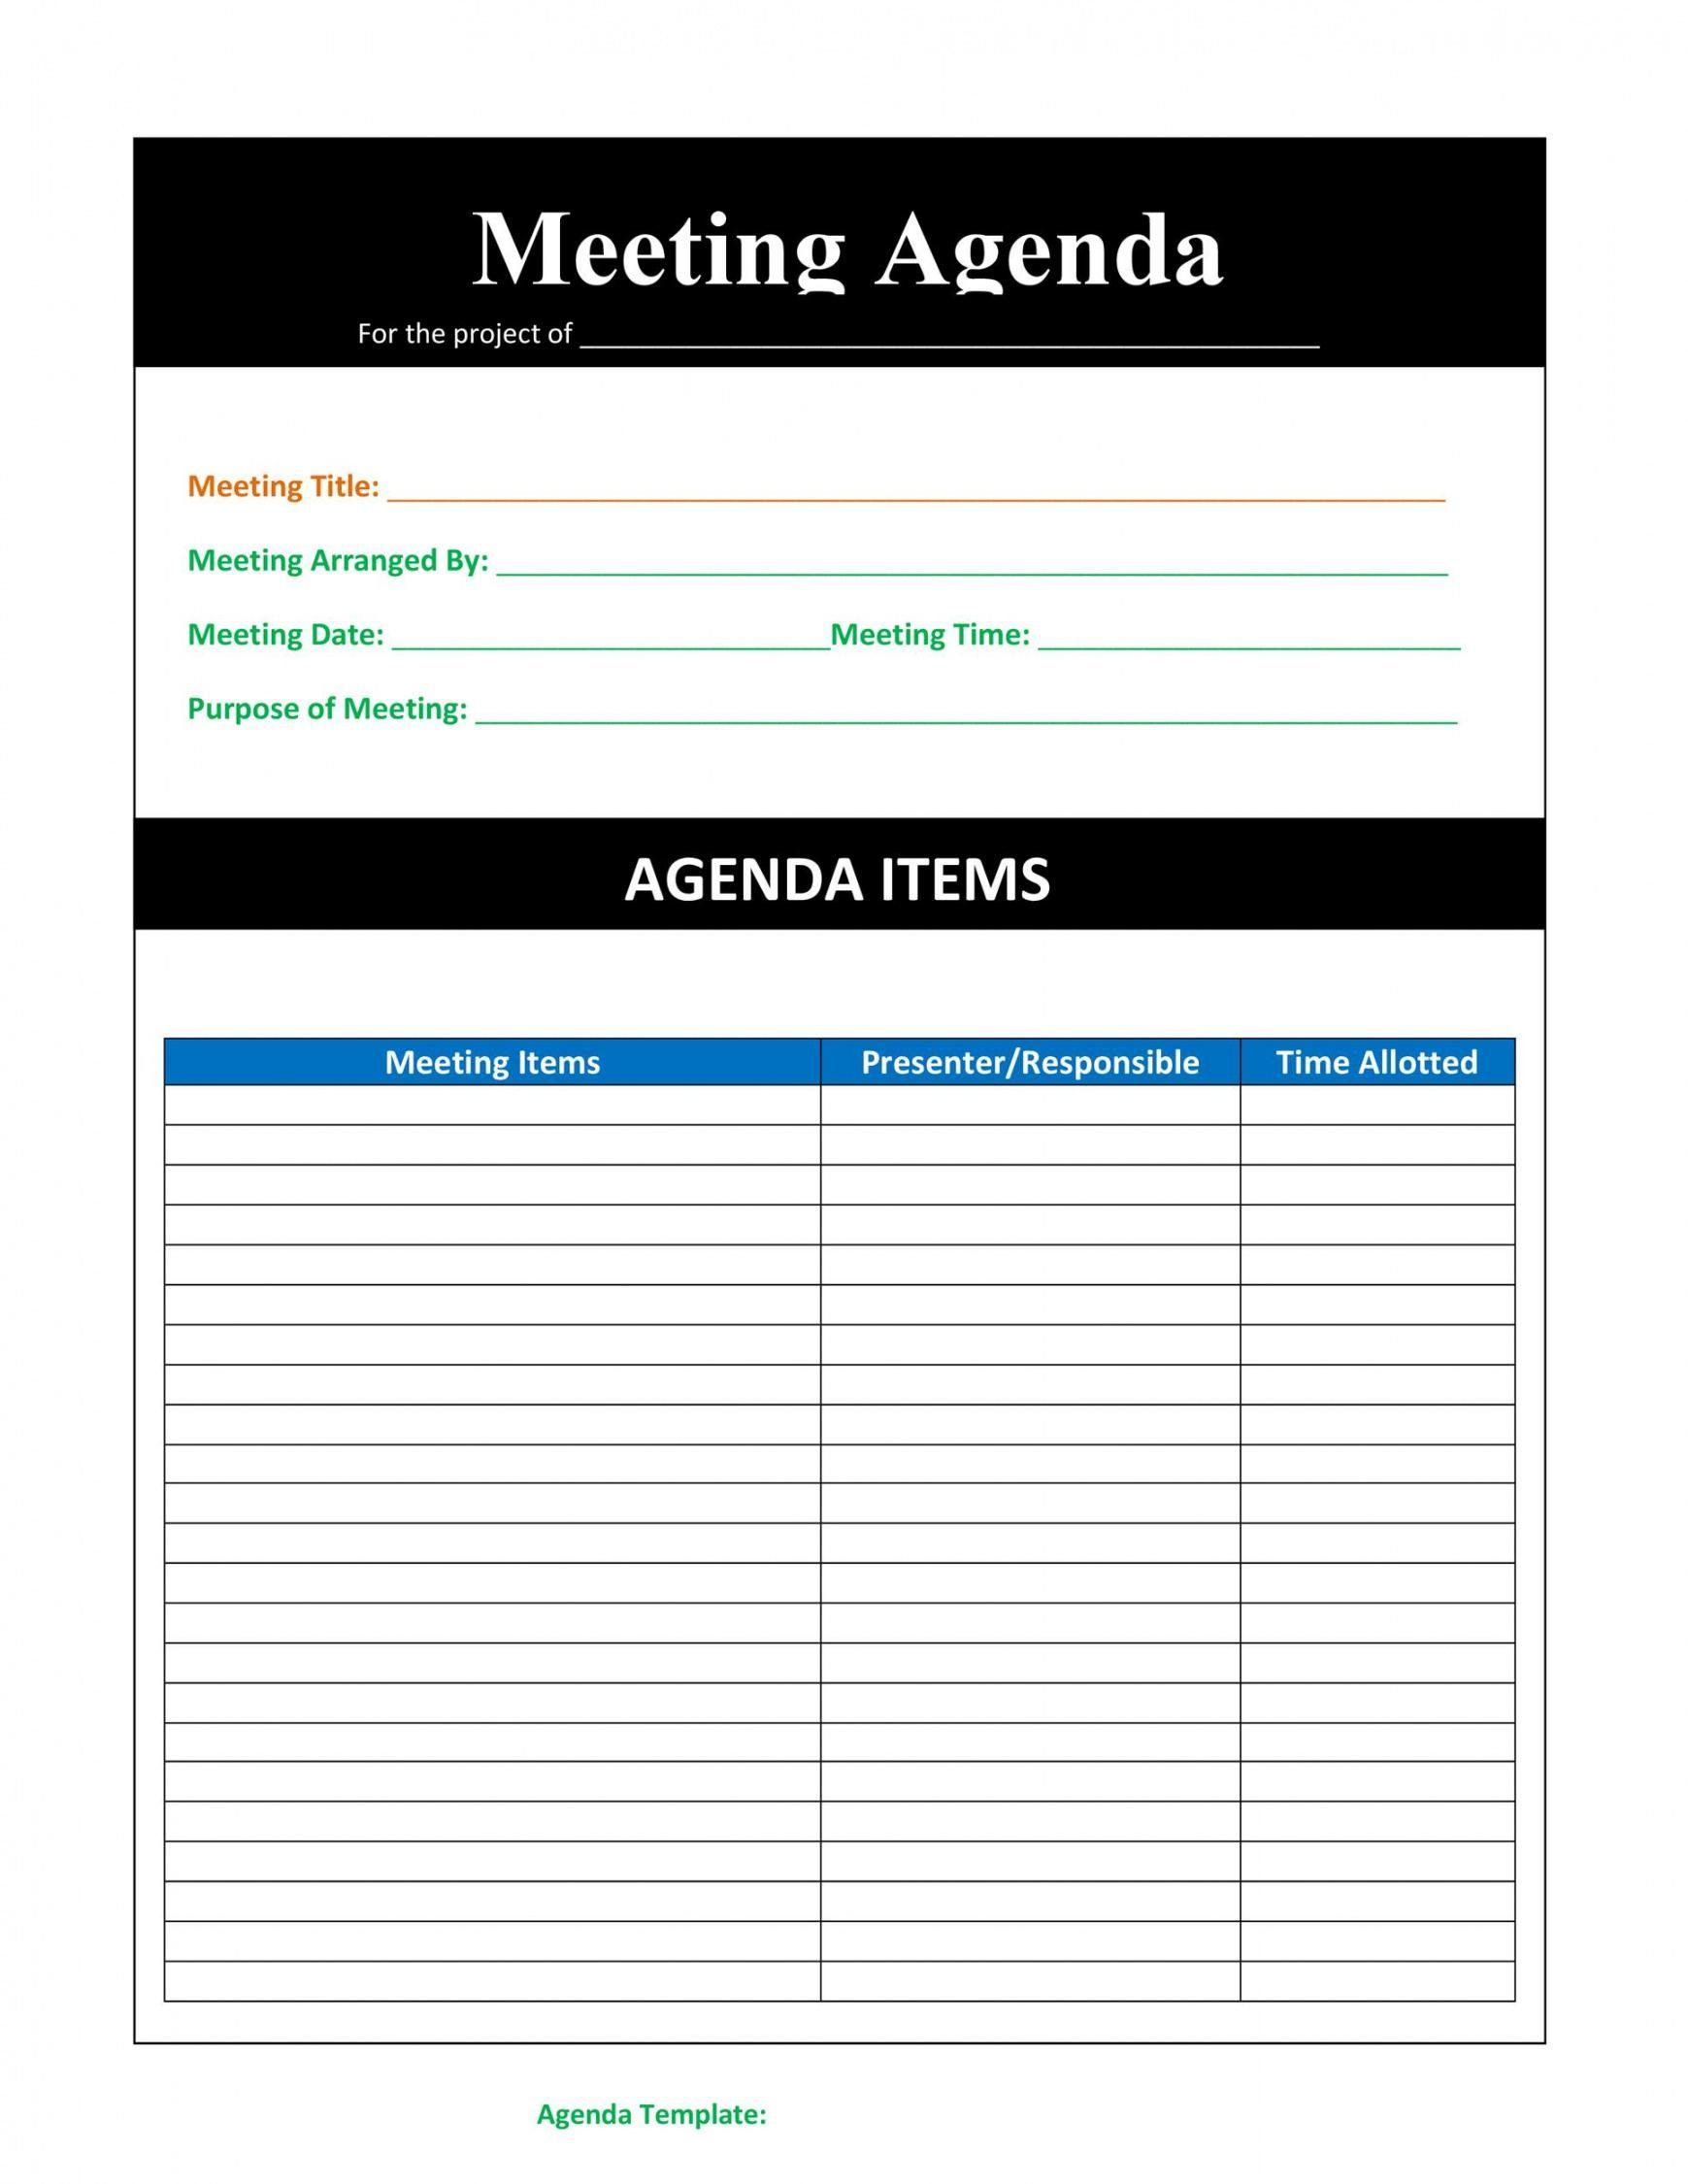 Workshop agenda template microsoft word